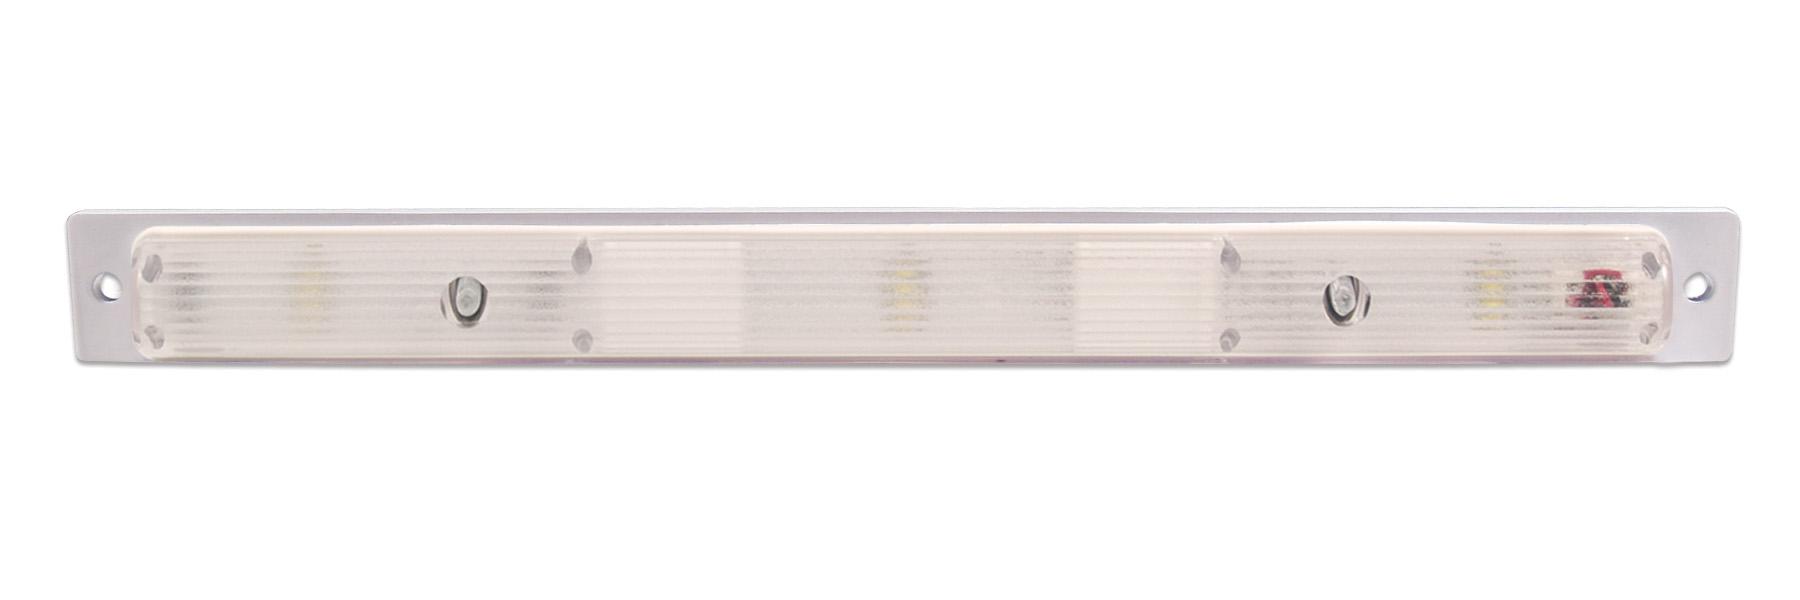 LED Strip Light Product Image